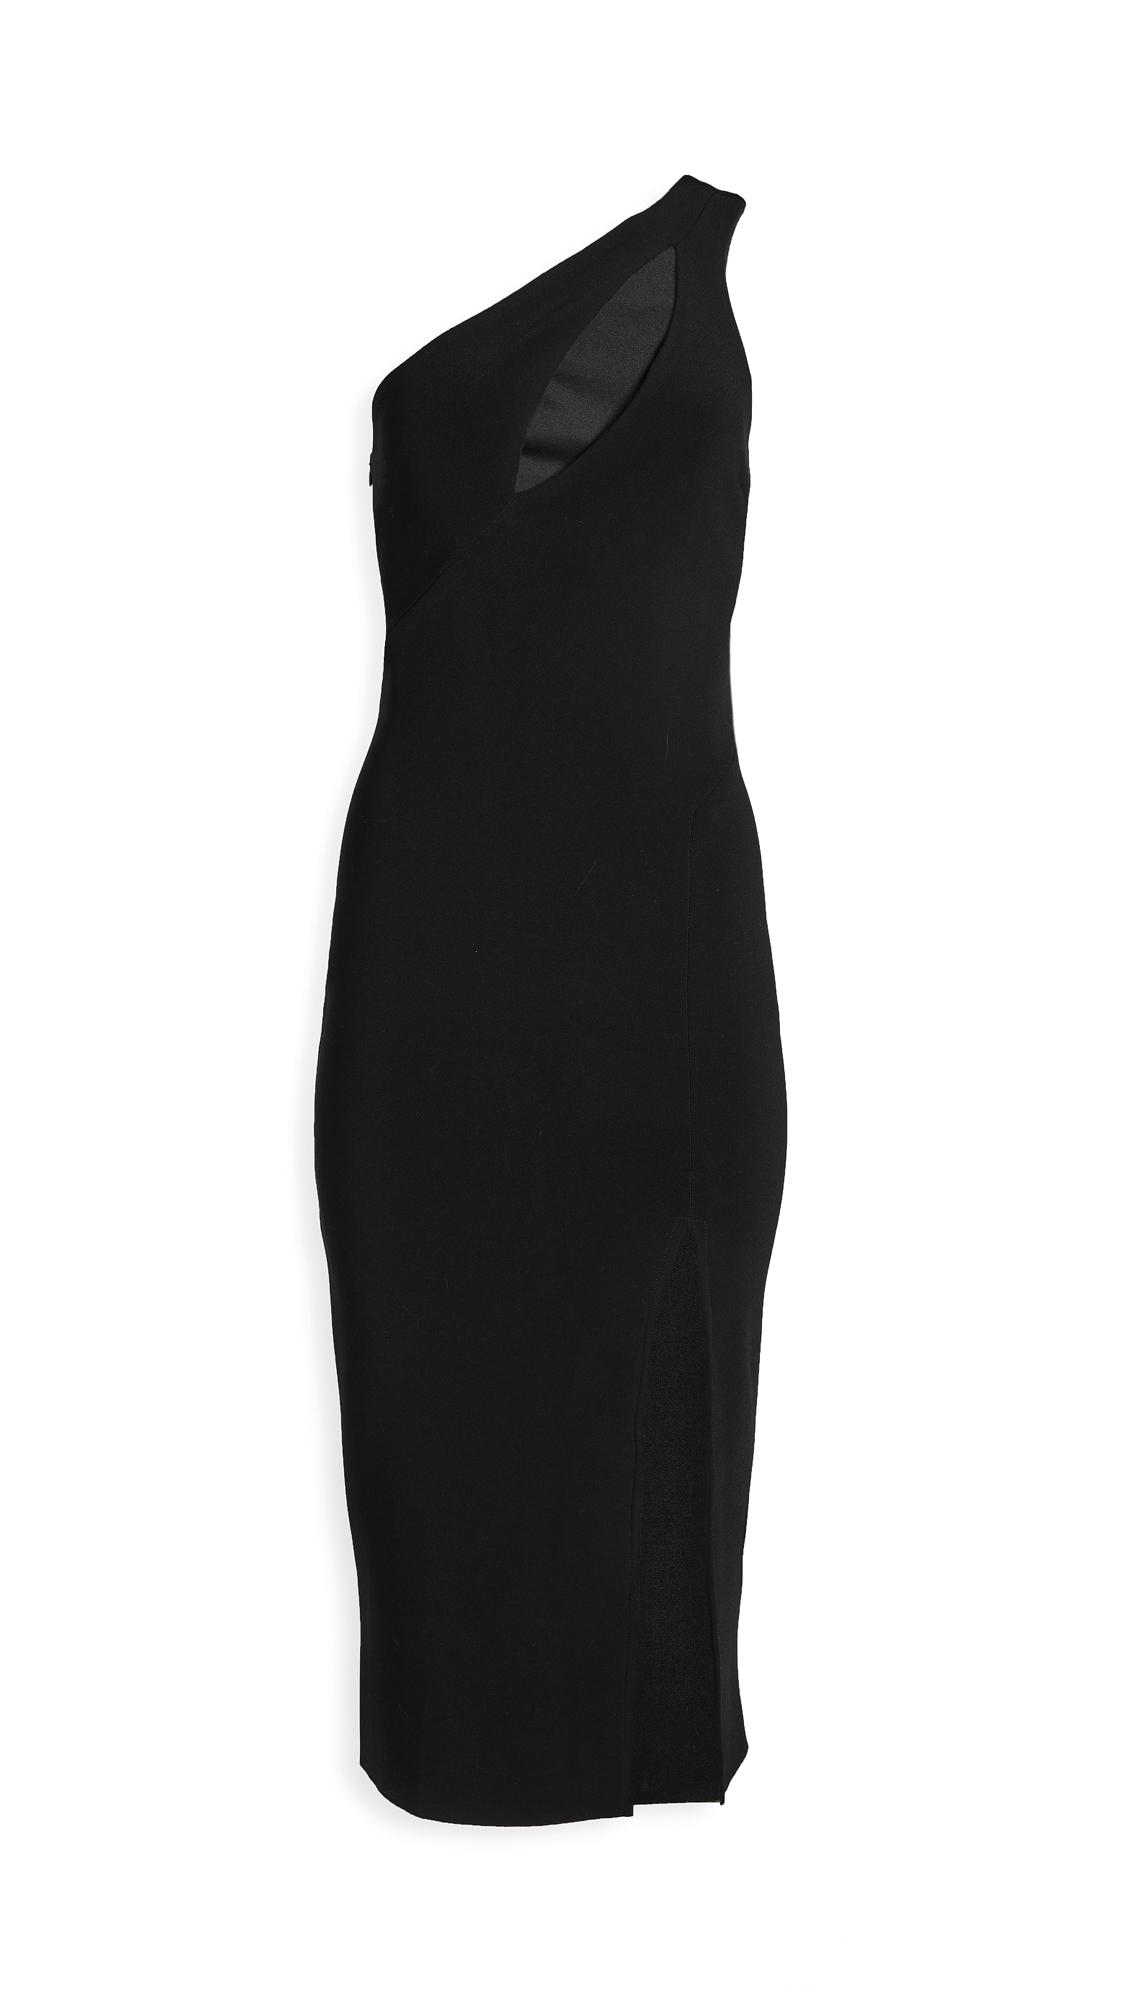 Bec & Bridge Emerald Avenue Asymmetric Midi Dress - 30% Off Sale